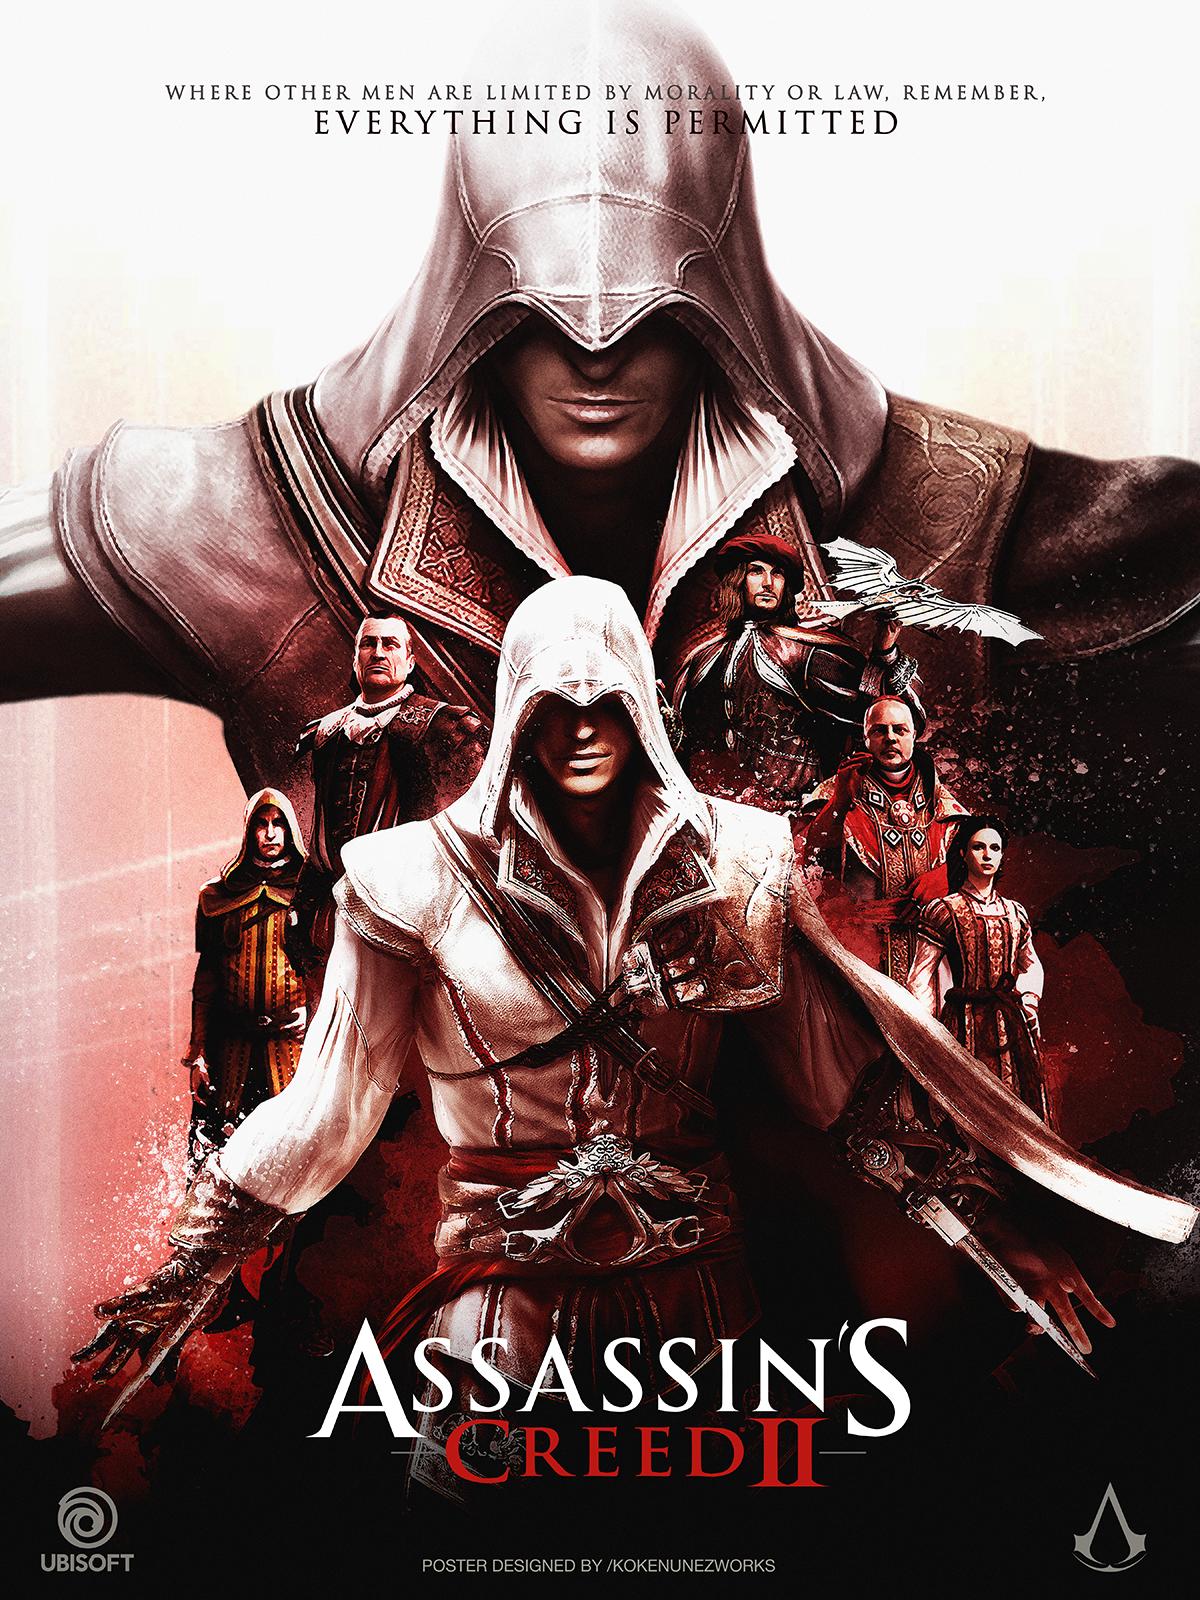 Assassin S Creed 2 Ezio S Trilogy Alternative Poster Posterspy Assassins Creed 2 Assassin S Creed Hd Assassin S Creed Wallpaper